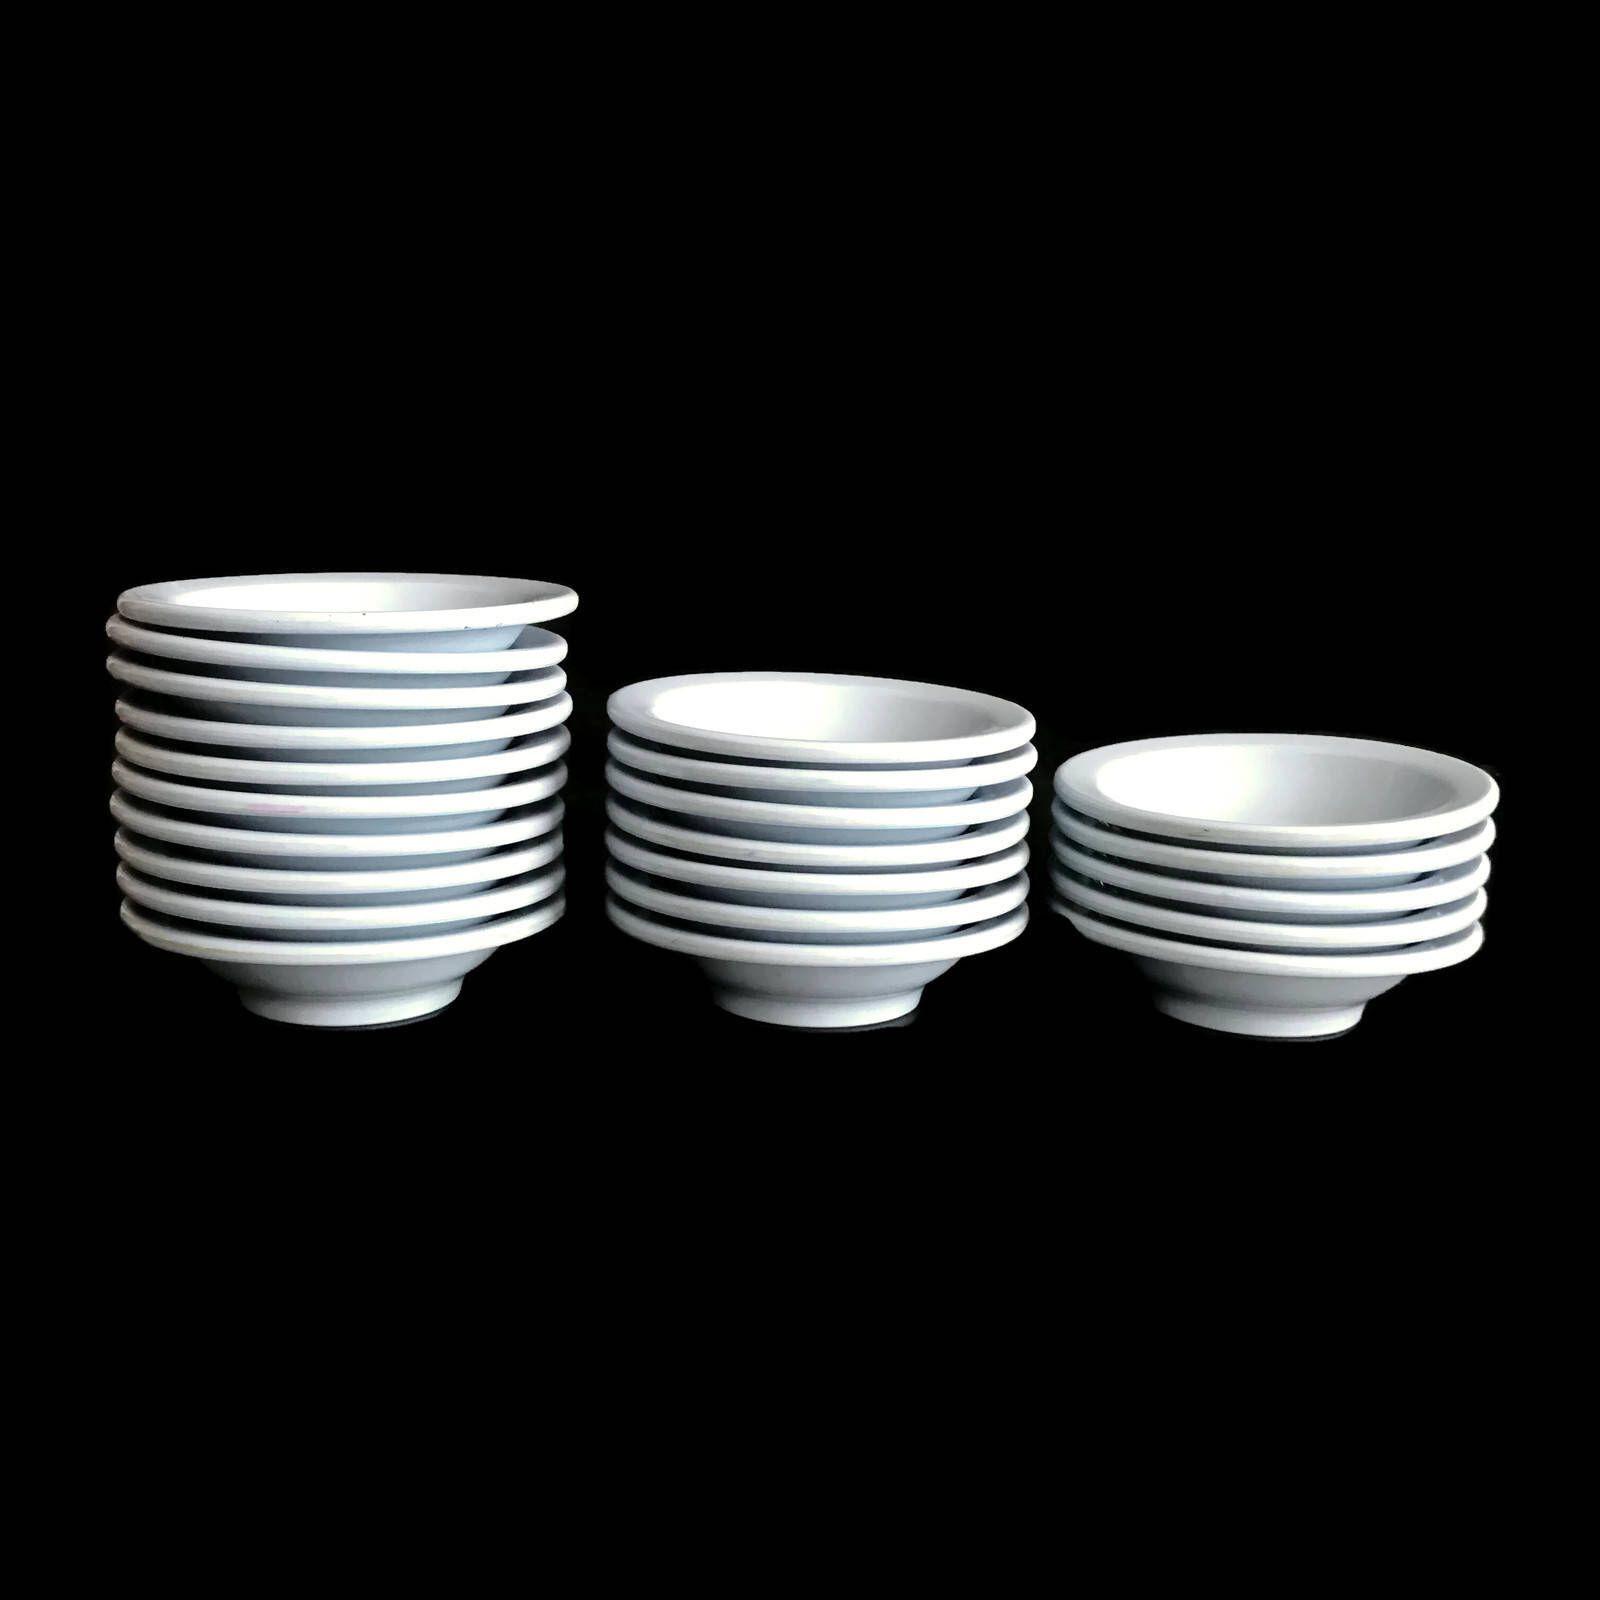 Vintage Boontonware 50s 60s Dinnerware 22 Berry Bowls Melmac Melamine Light Blue Heavy Duty Tableware Plastic  sc 1 st  Pinterest & Vintage Boontonware 50s 60s Dinnerware 22 Berry Bowls Melmac ...